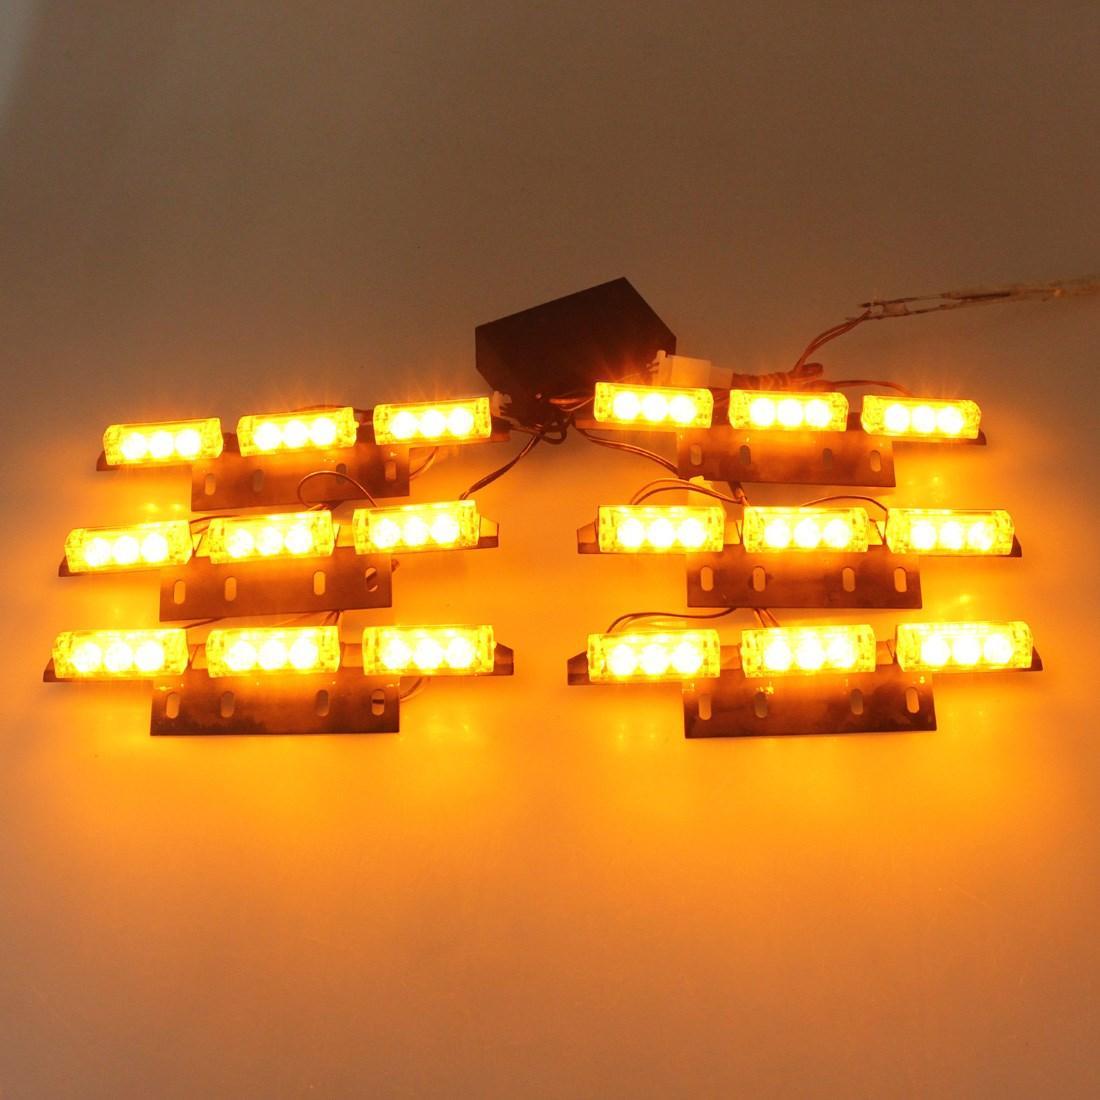 new 54 led emergency car strobe lights yellow automotive explosive